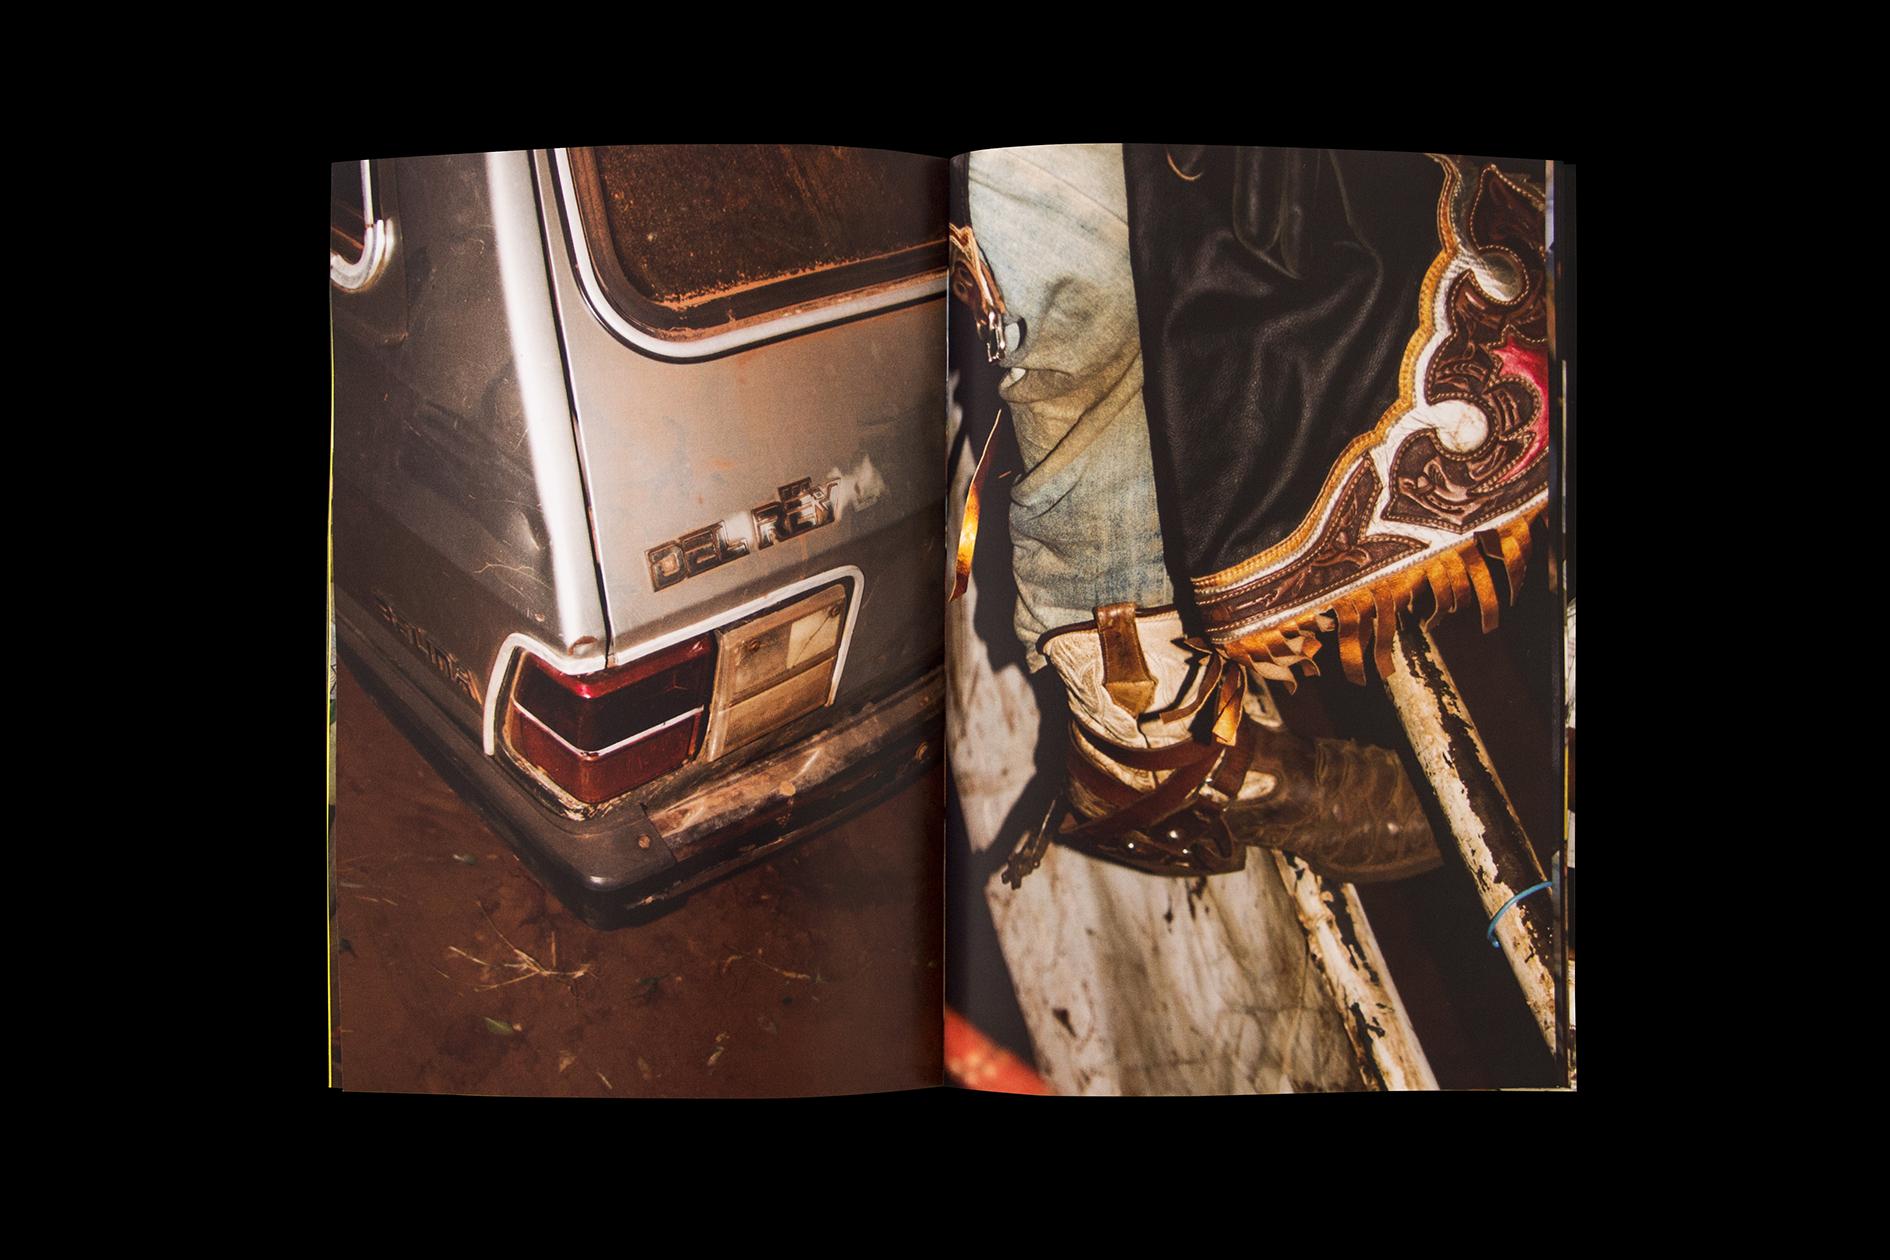 bc-ss_0004s_0002_Brazilian Cowboy_0003_3.jpg